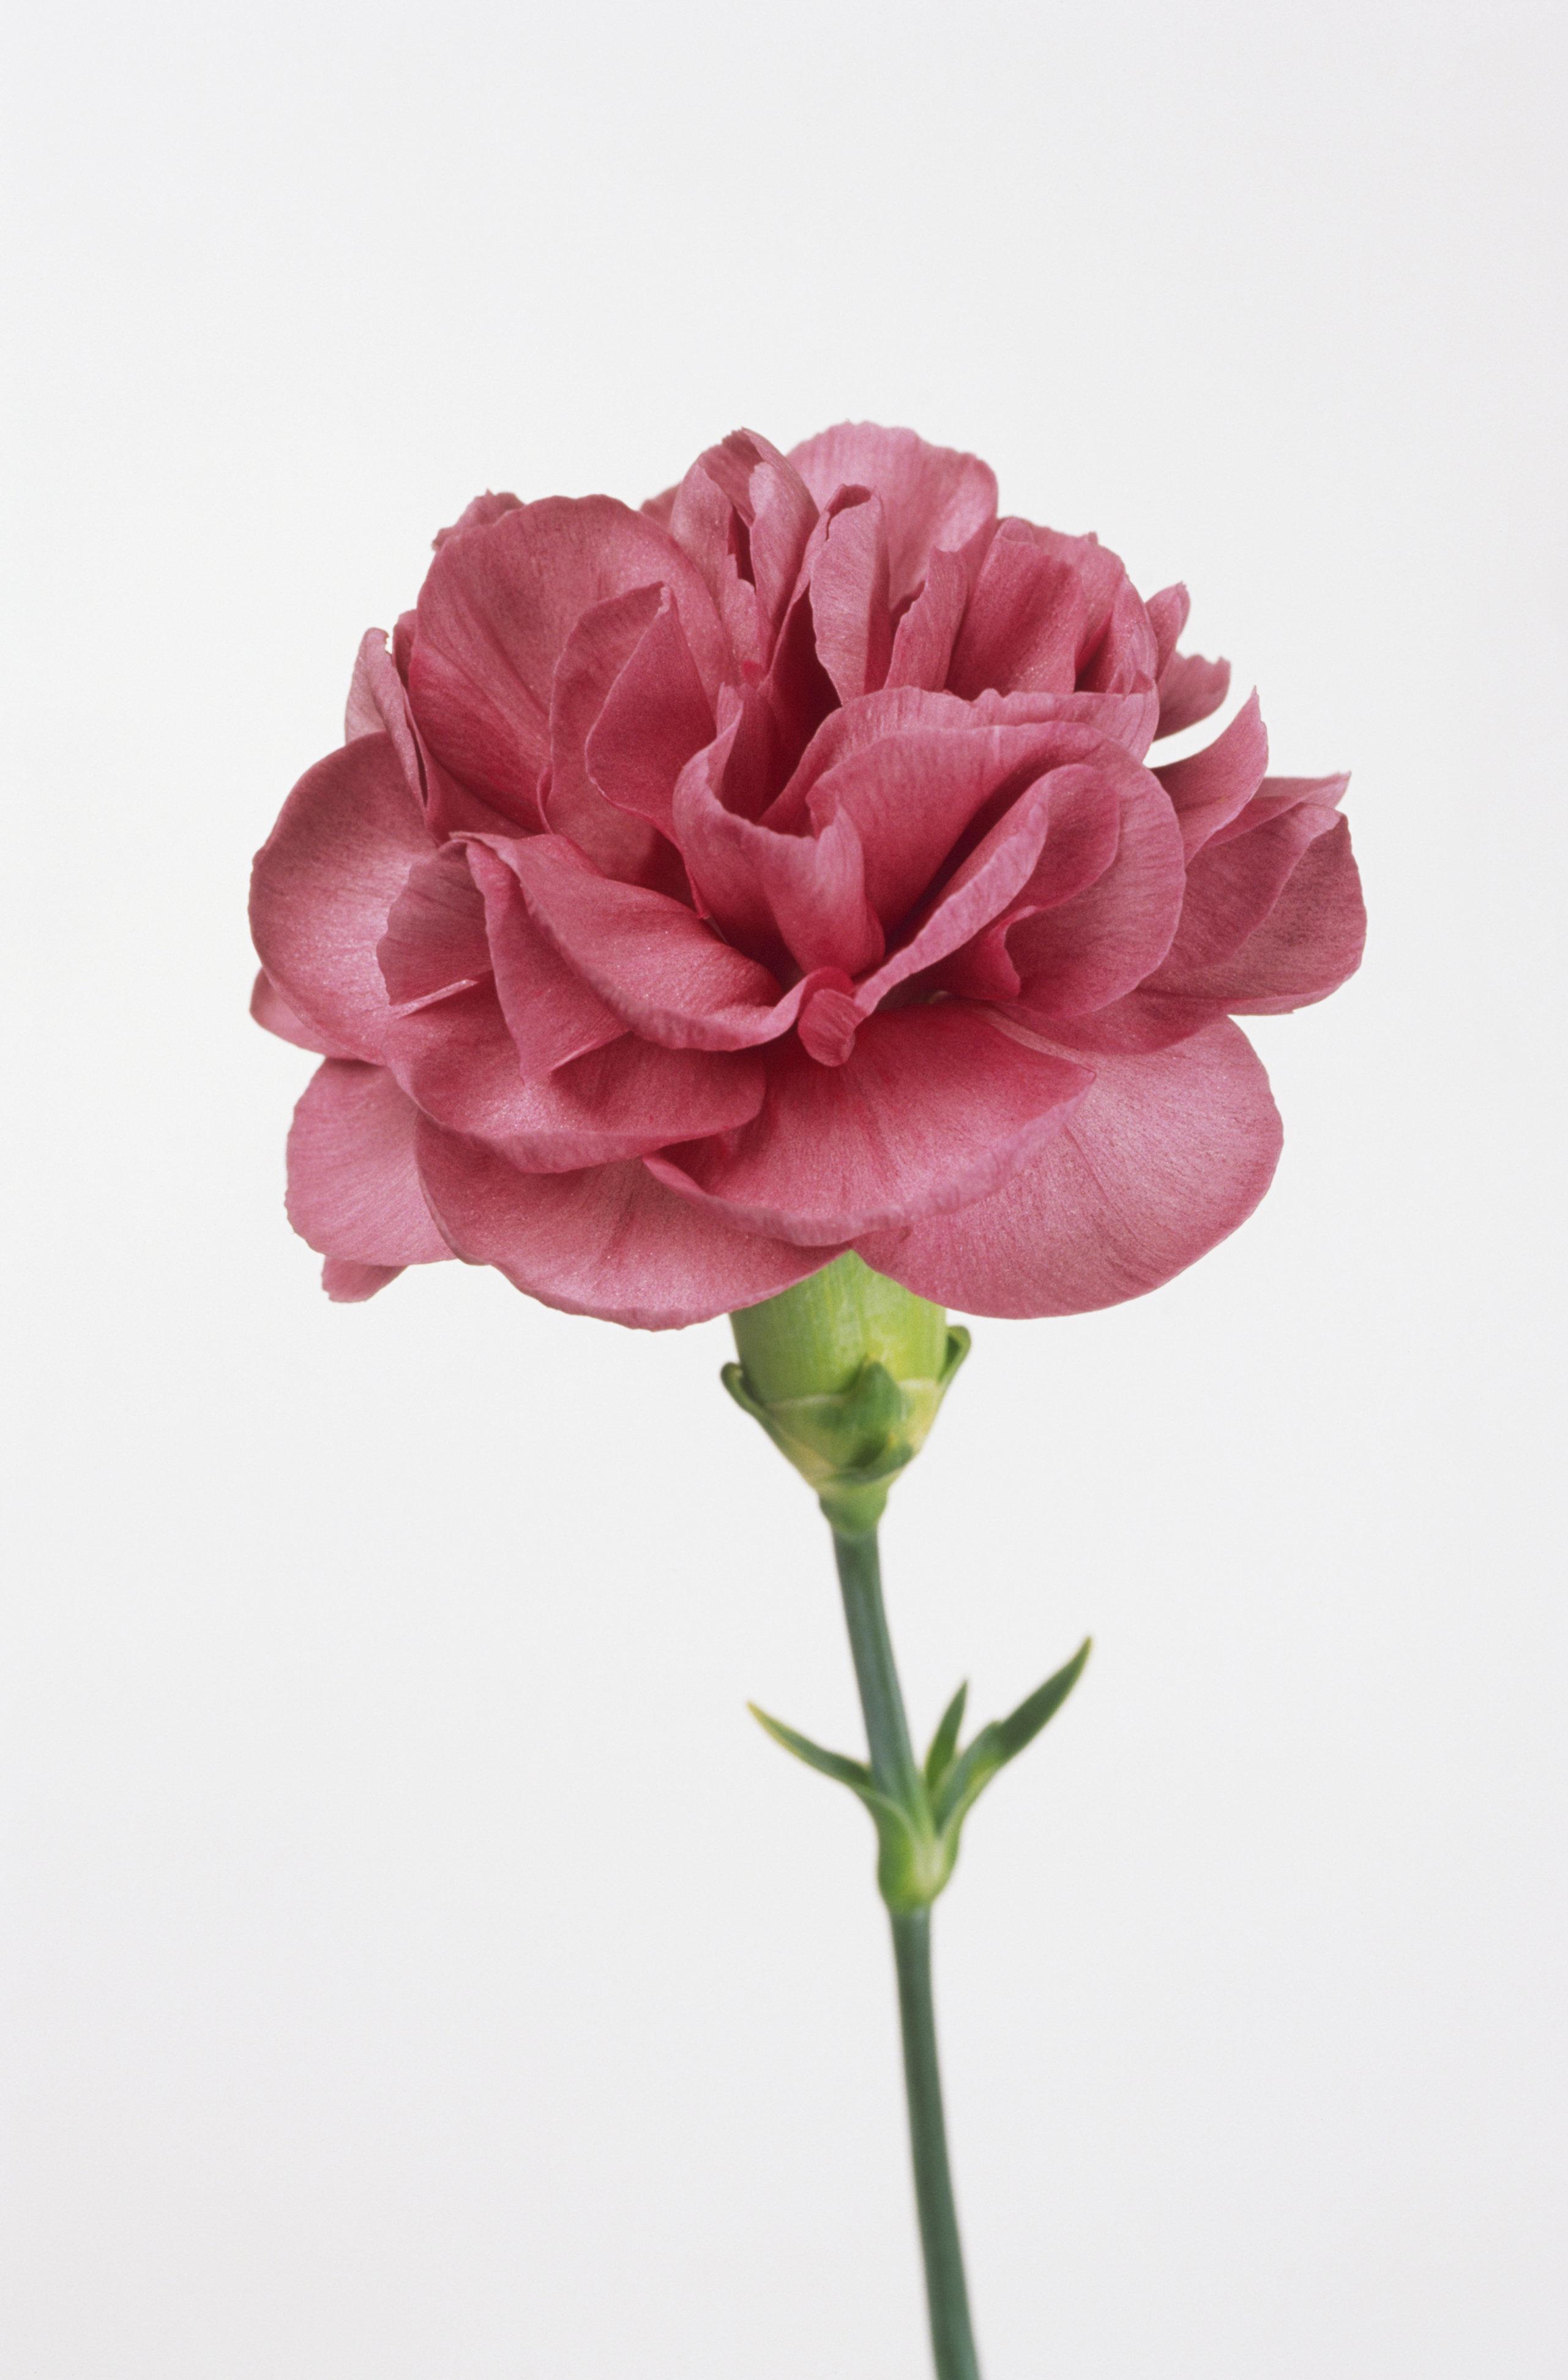 Dianthus 'Lavender Clove' (Carnation), flower head on tall stem, with deep pink petals